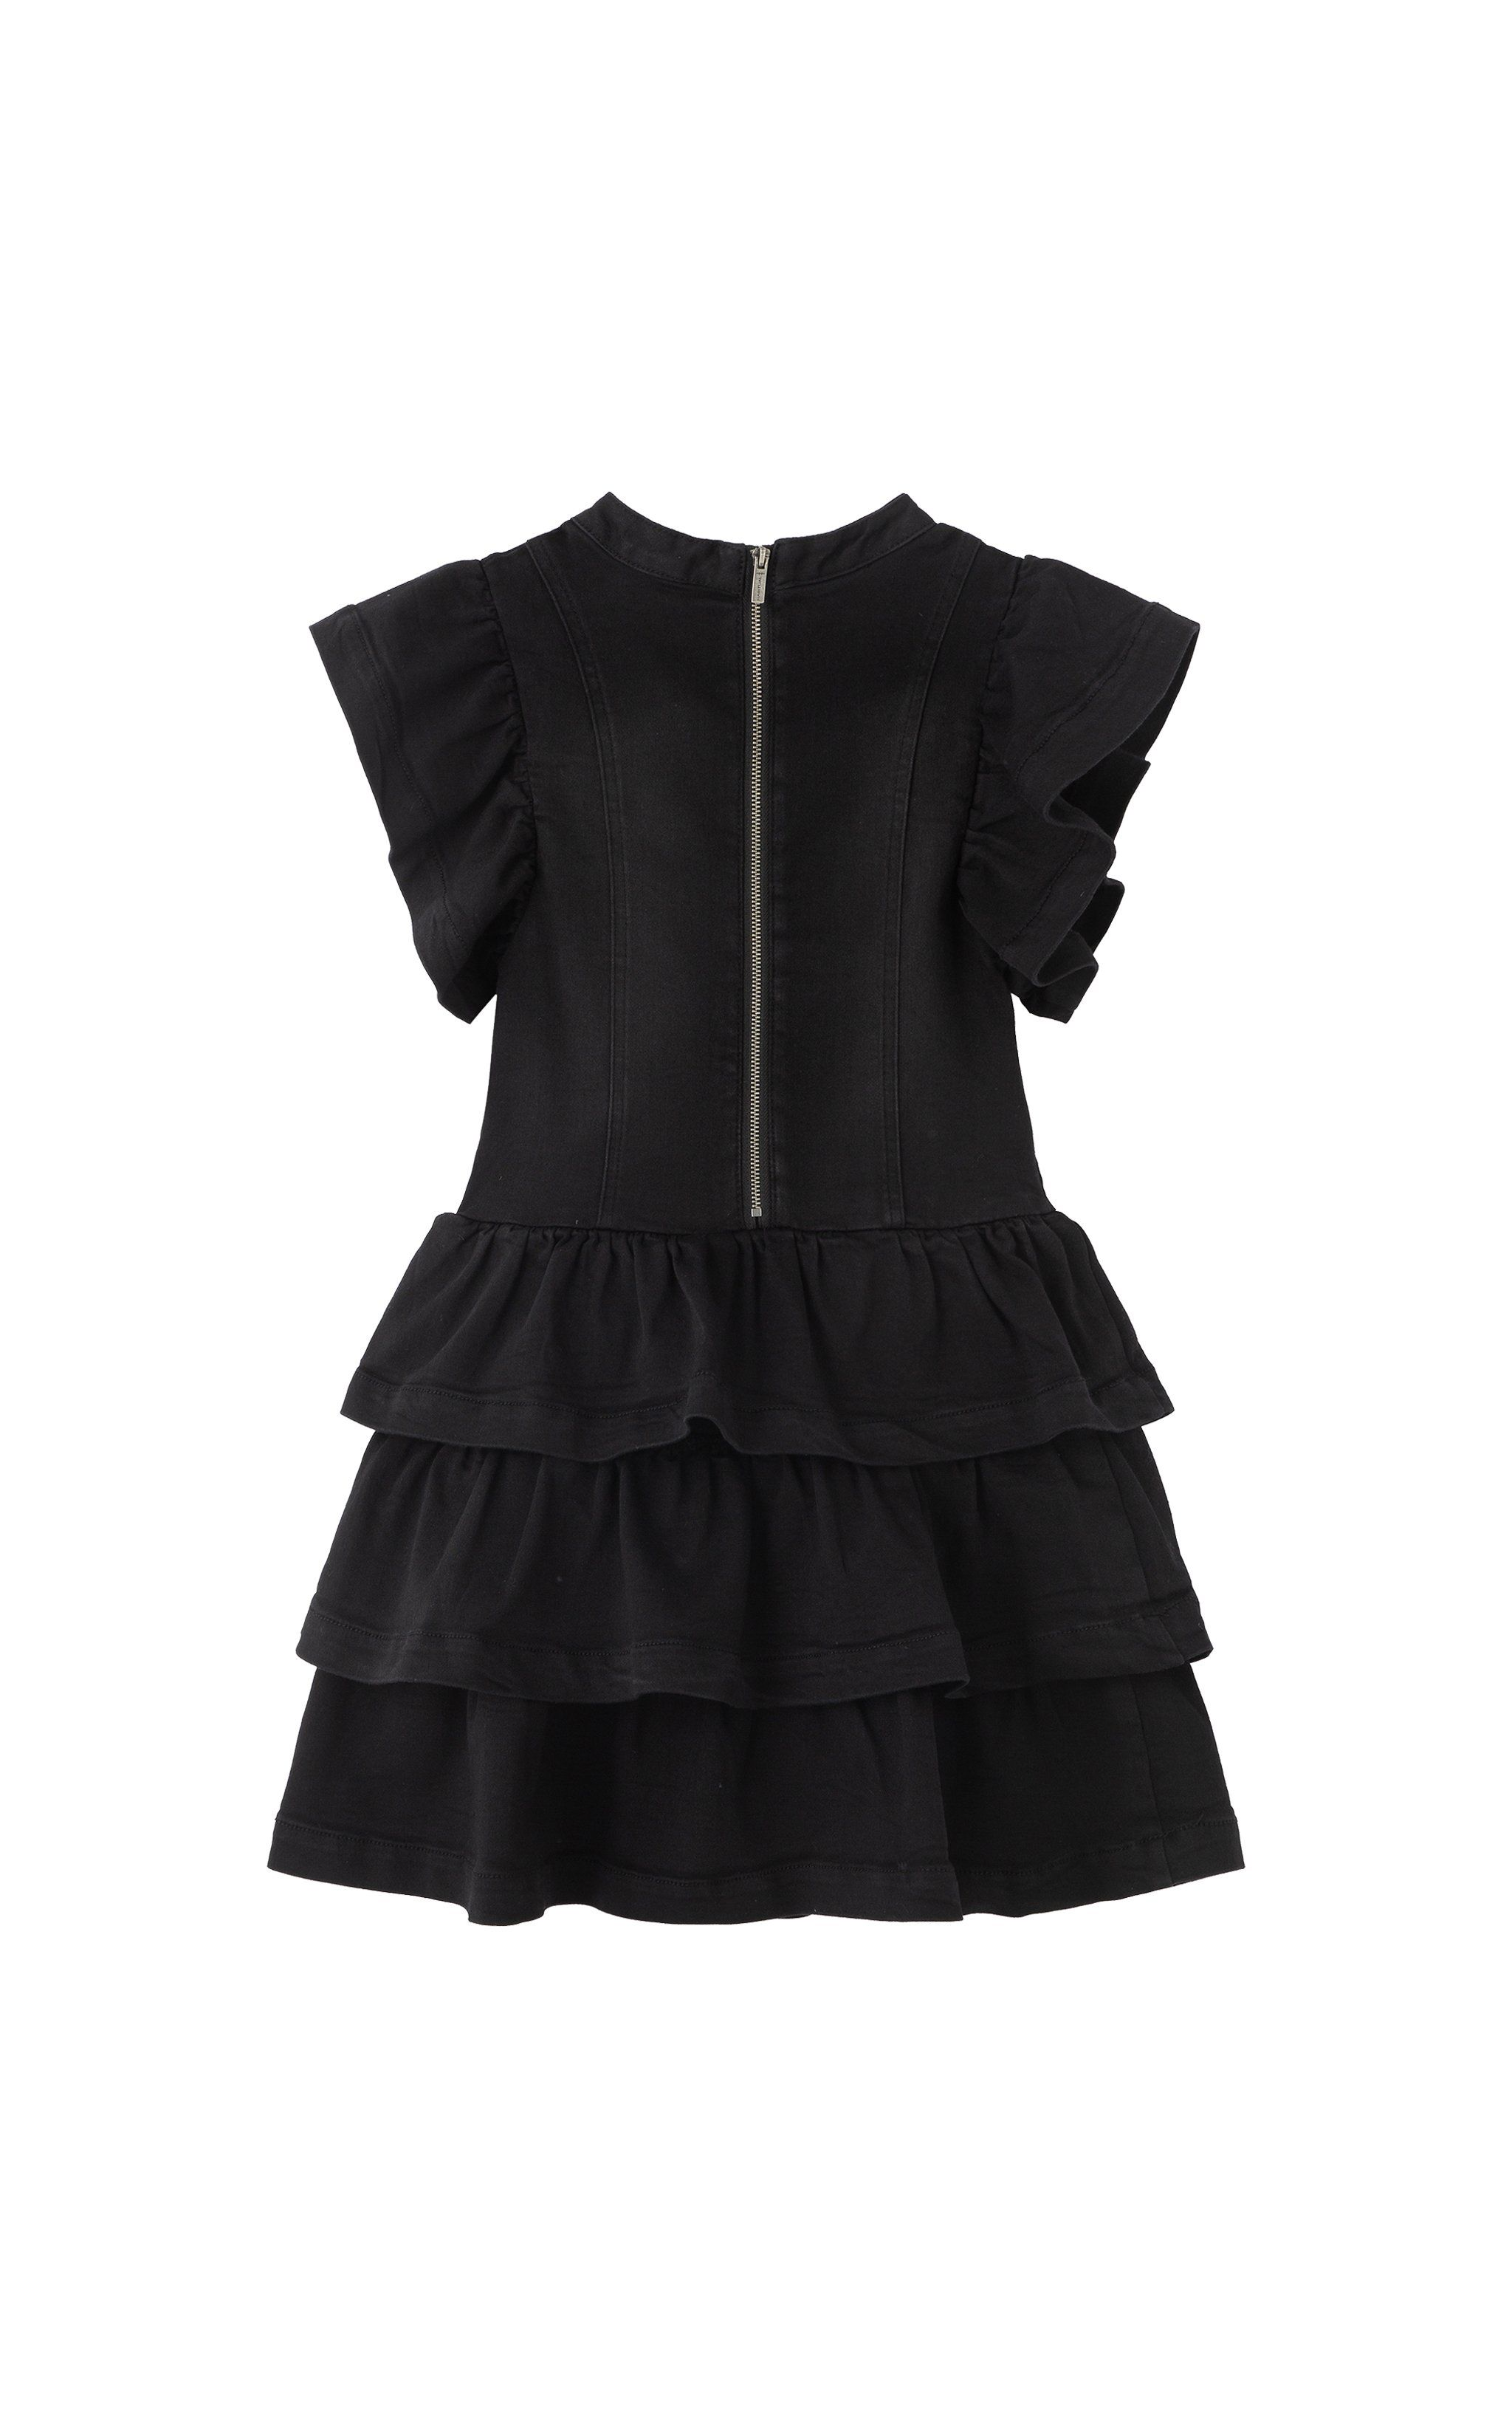 Paeton Tiered Ruffle Denim Dress 7 16 Habitual Denim Ruffle Dress Denim Dress Tiered Ruffle Dress [ 3277 x 2048 Pixel ]